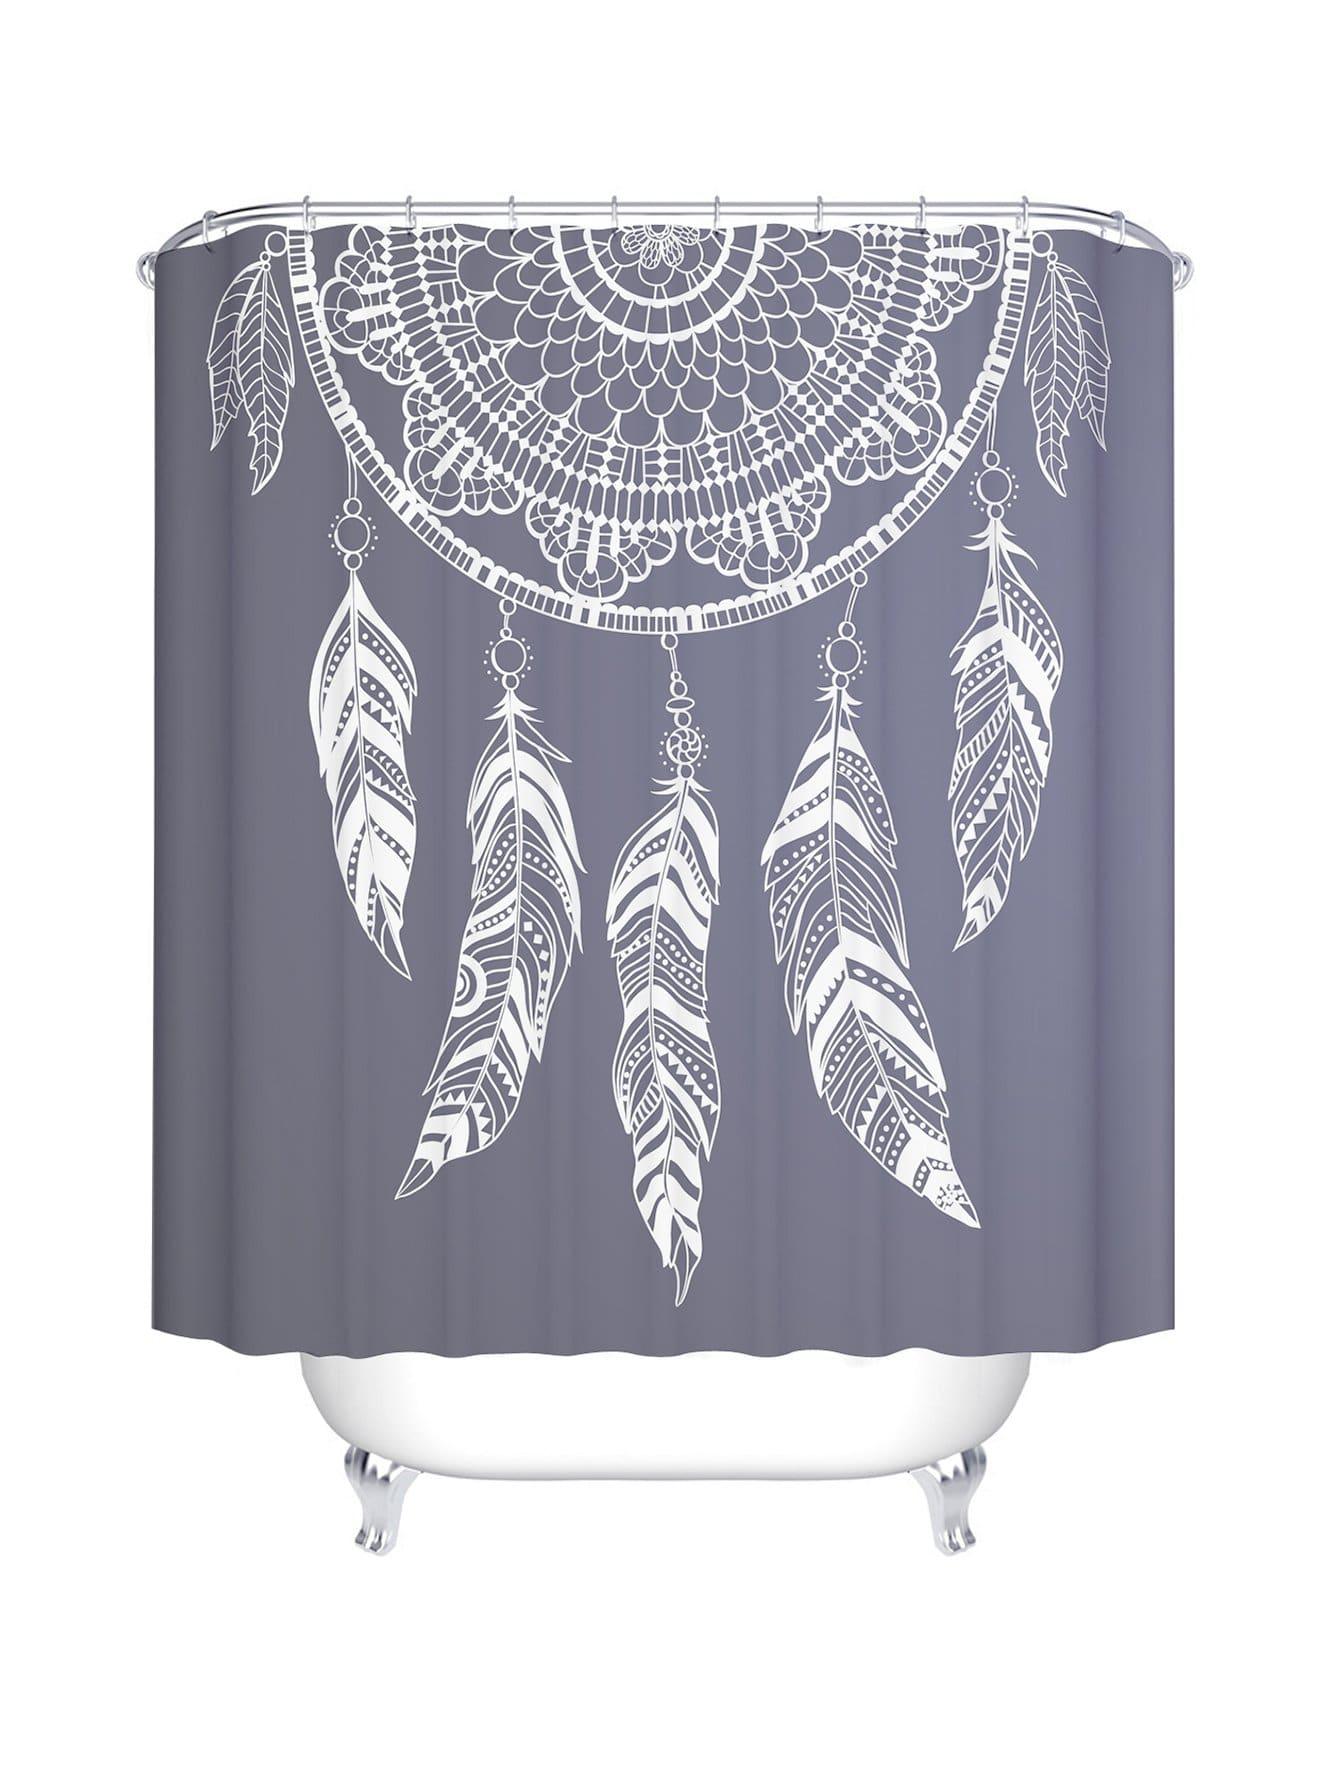 Duschvorhang mit Traumfänger Muster 12pcs Haken